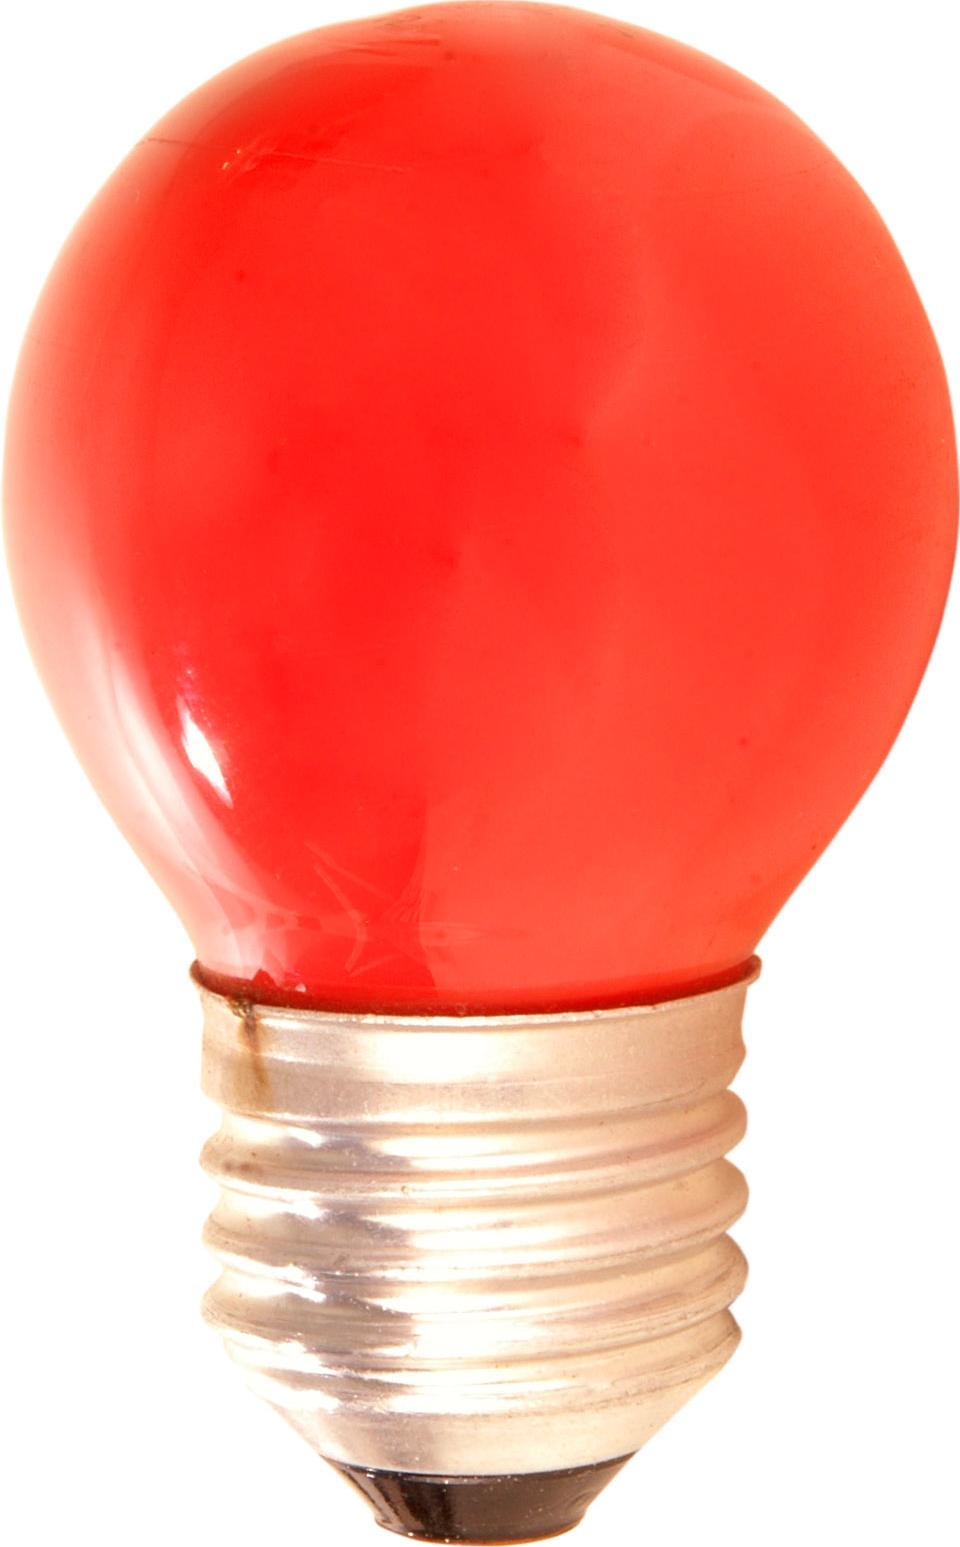 lamp PNG image.